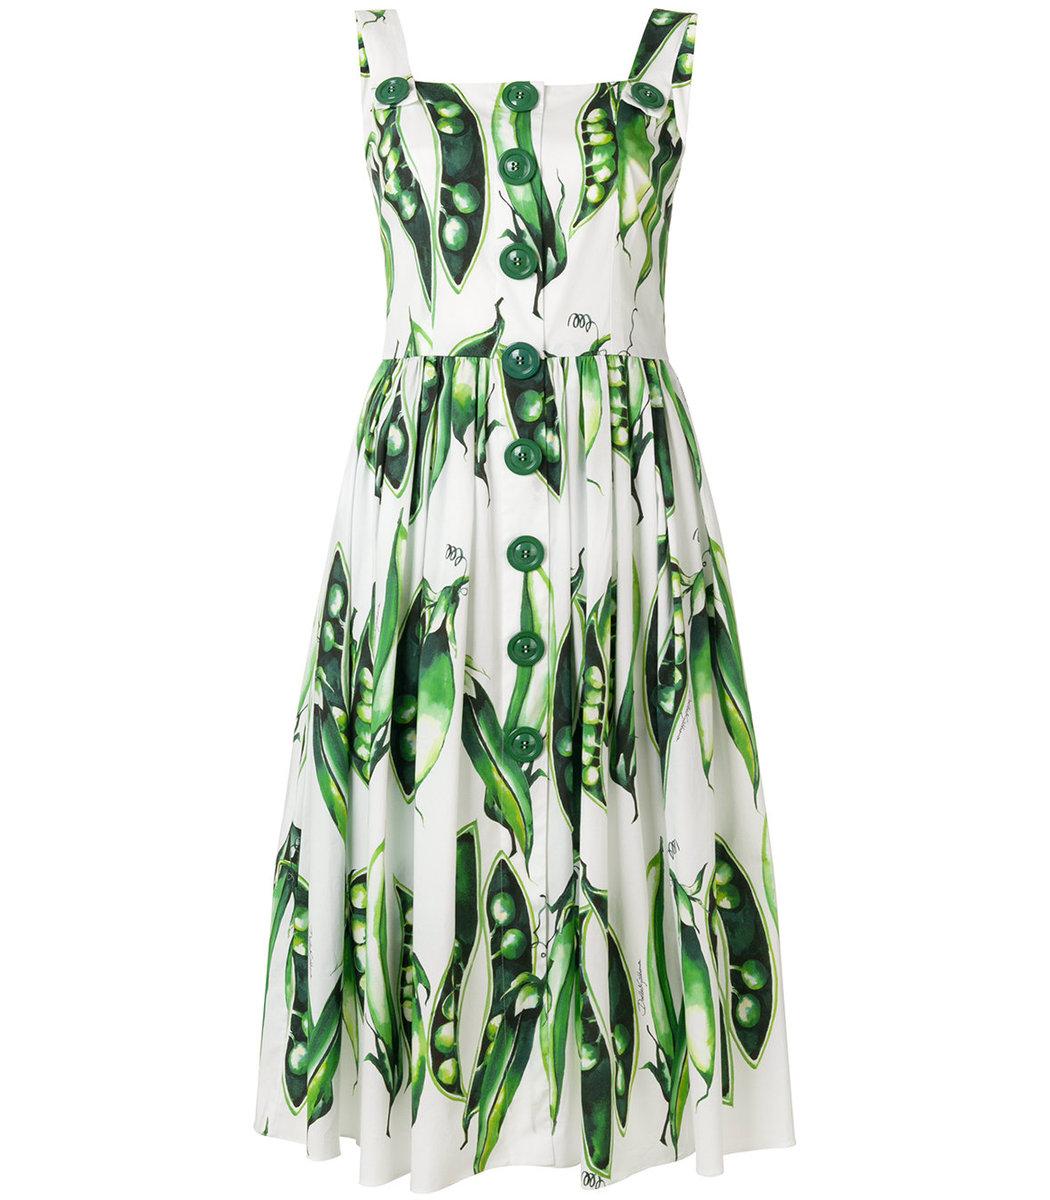 DOLCE & GABBANA Green & White Snap Pea Midi Dress